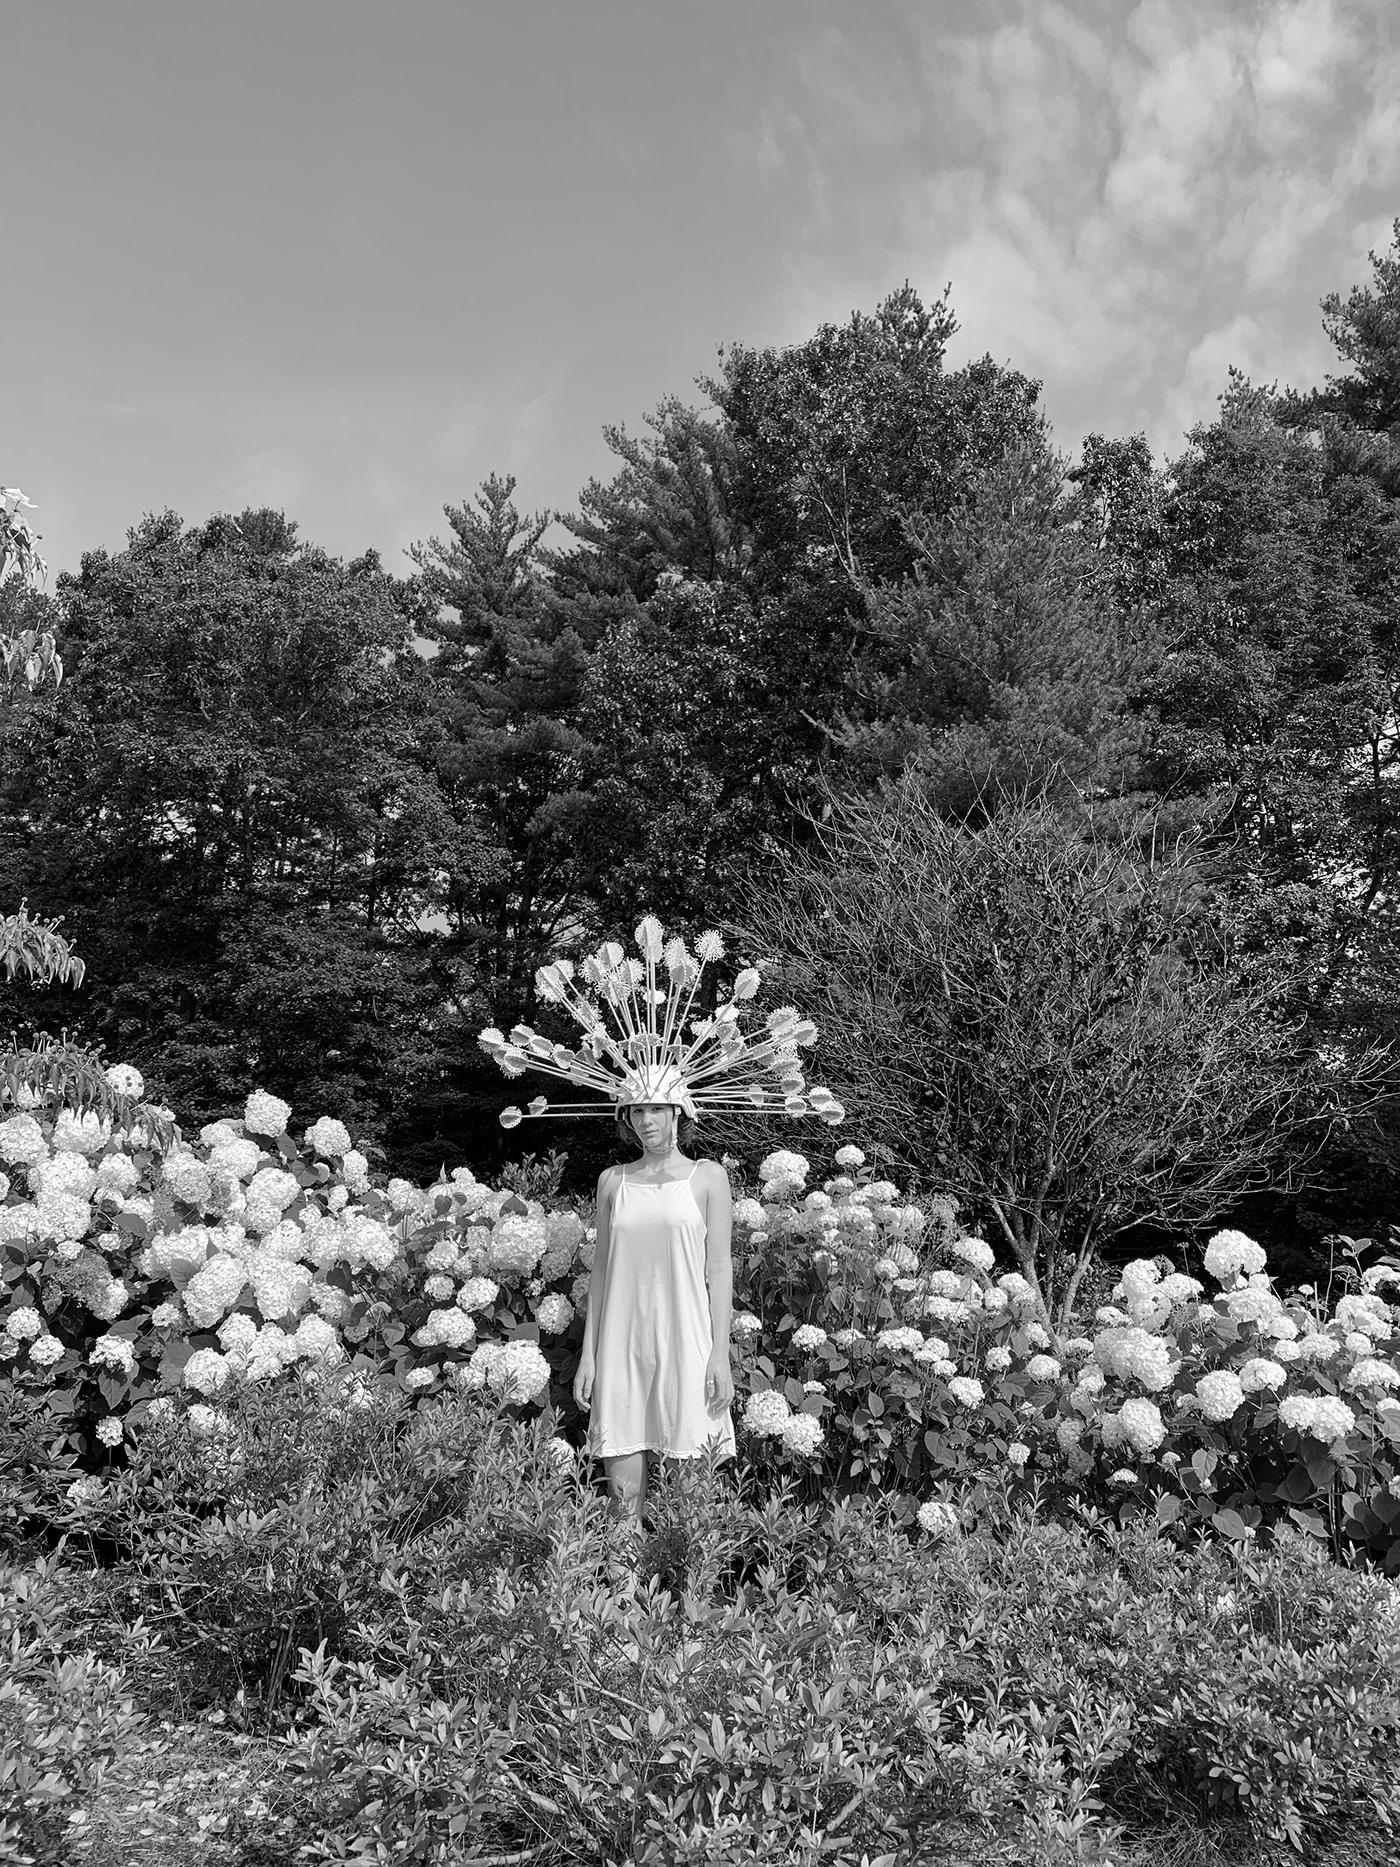 Fashion  dandelion apparel high fashion Wearable Sculpture sculpture jewelry Lemonbark Orangebark art